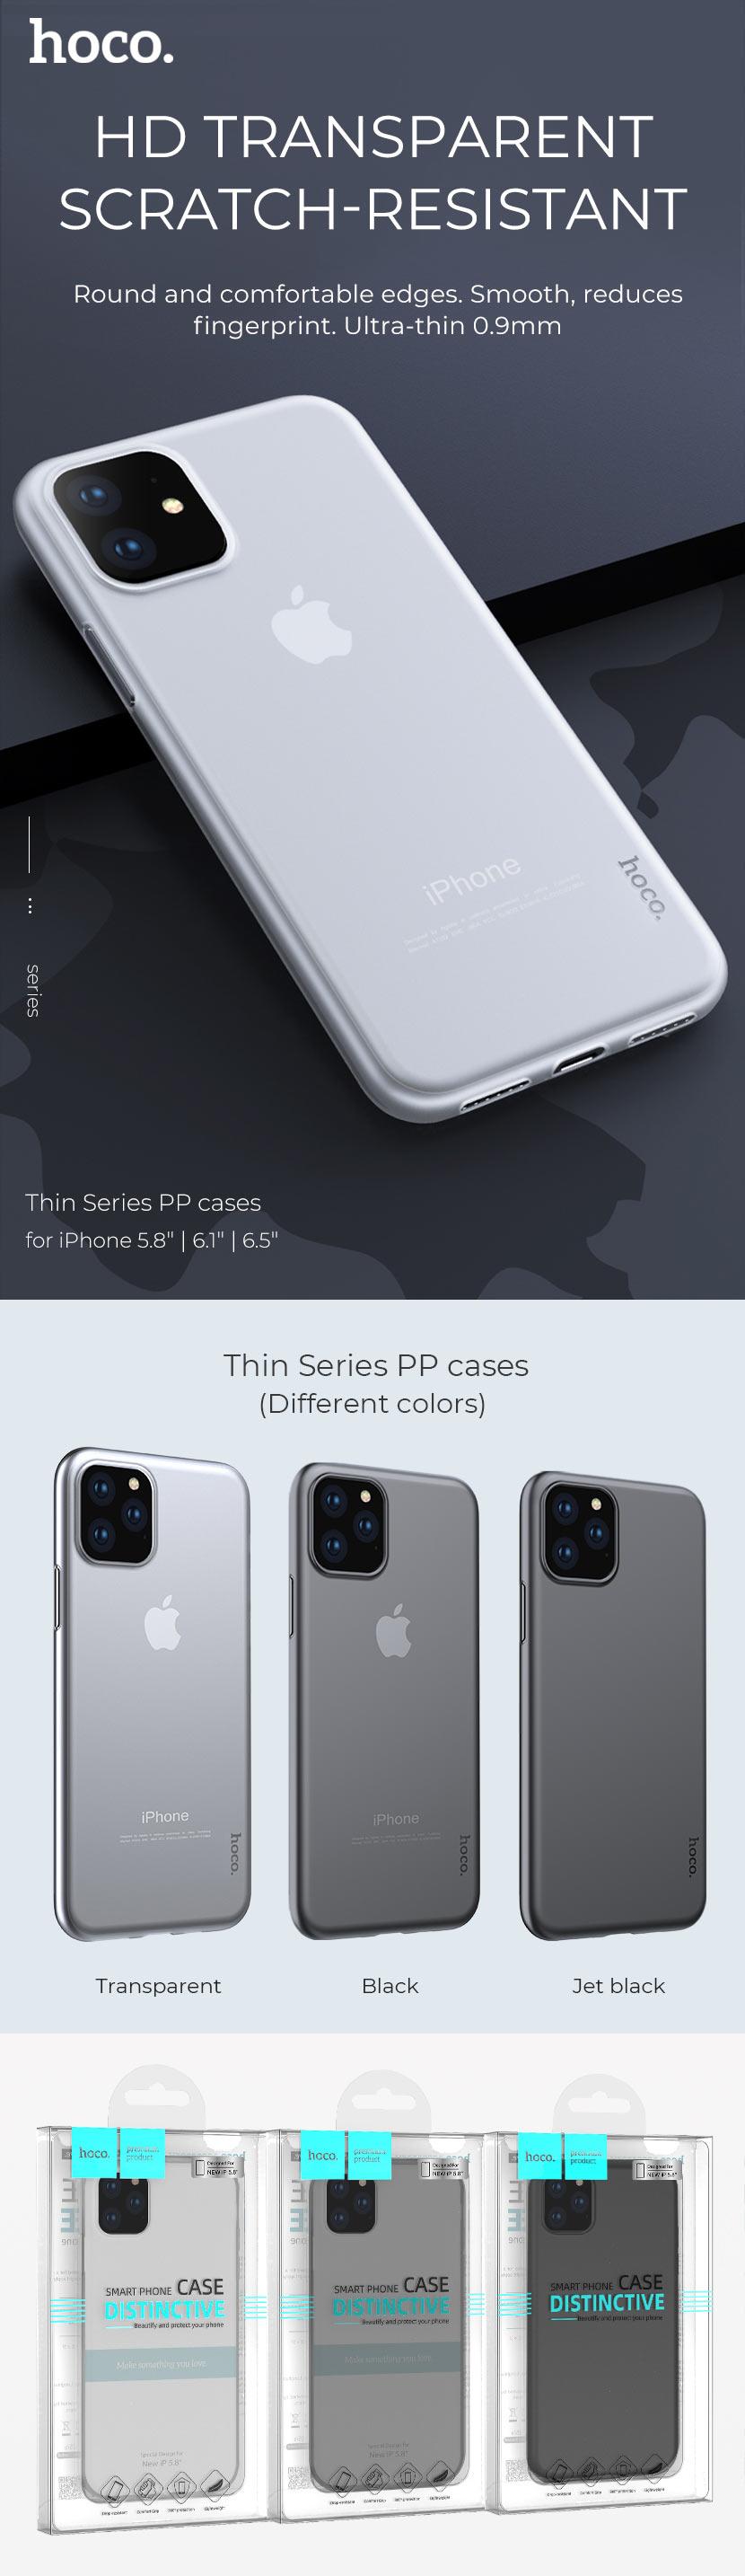 hoco news 2019 iphone case collection thin series en